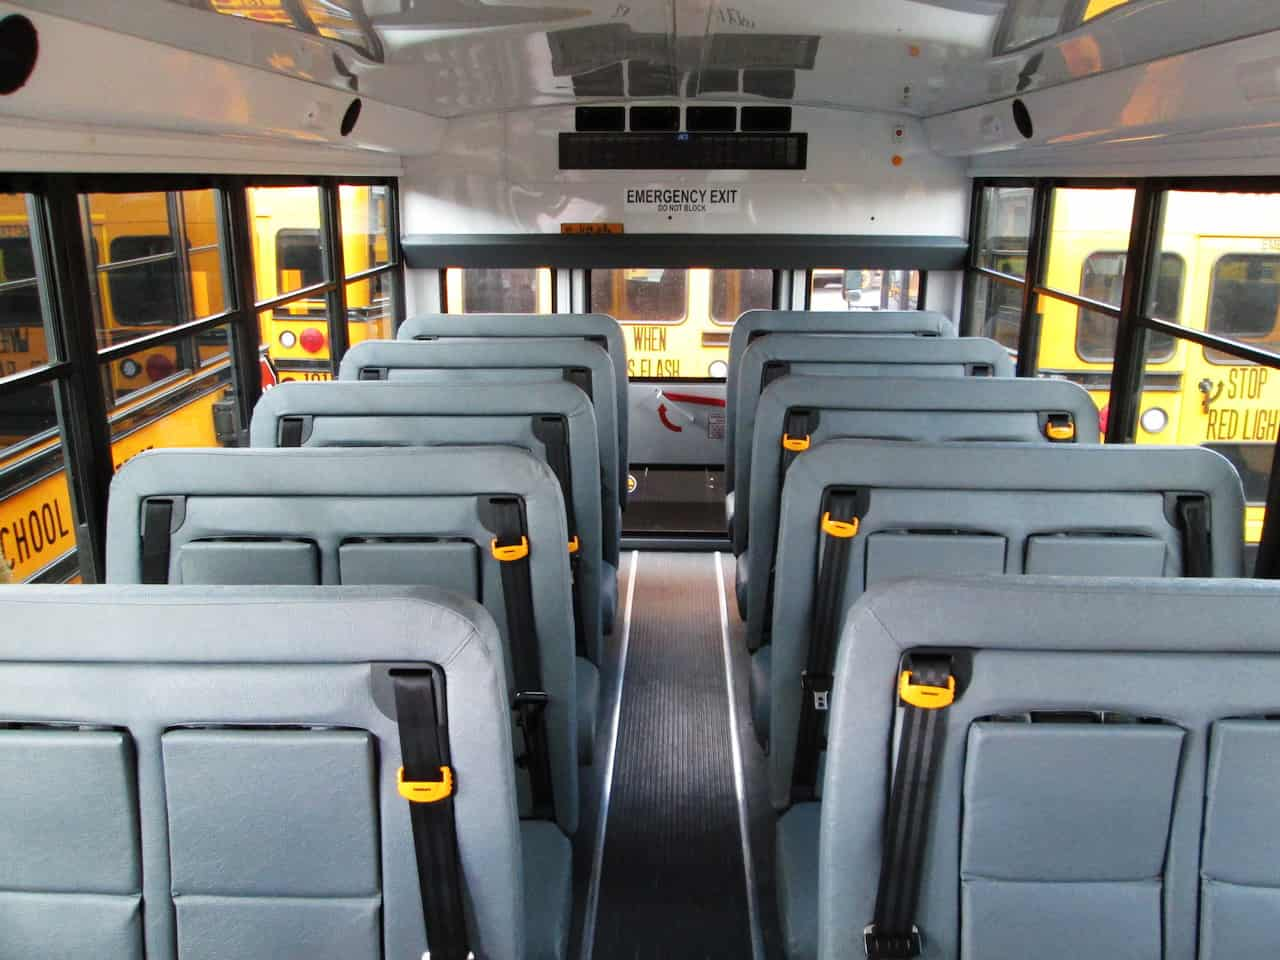 Utah School Bus Seat Belt Bill Fails Again in House - STN Media